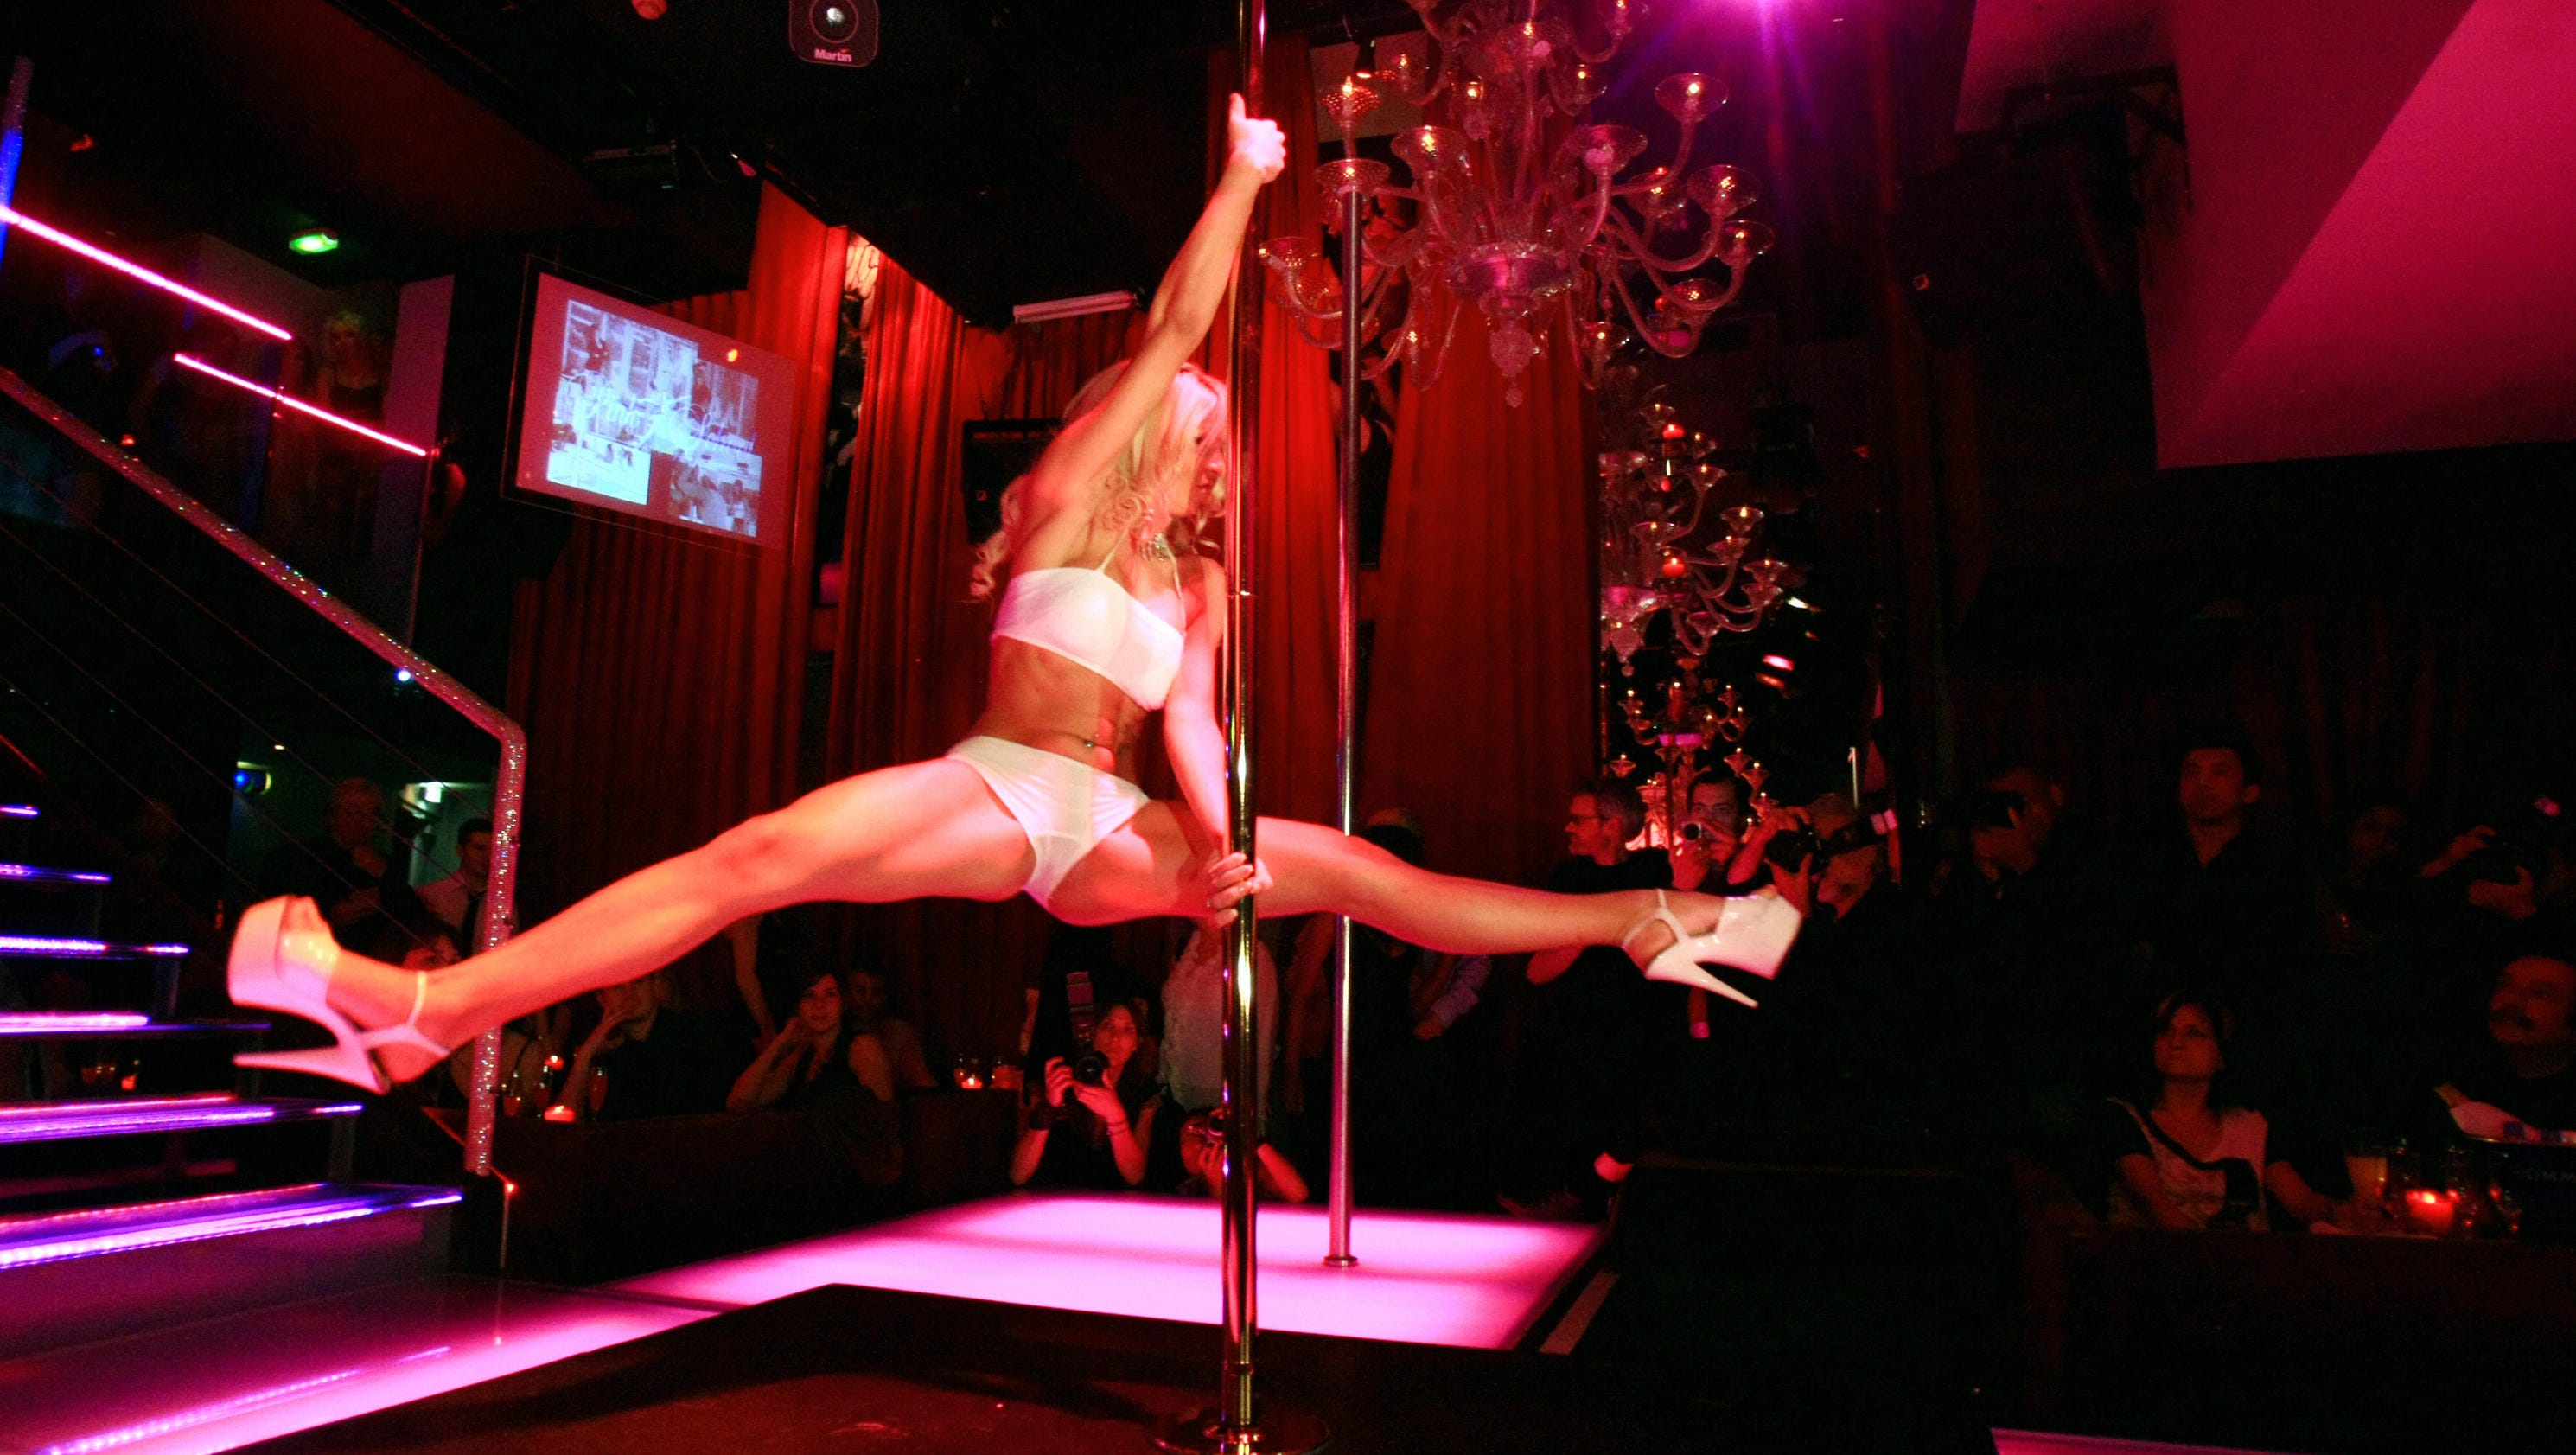 Bilderesultat for stripclub